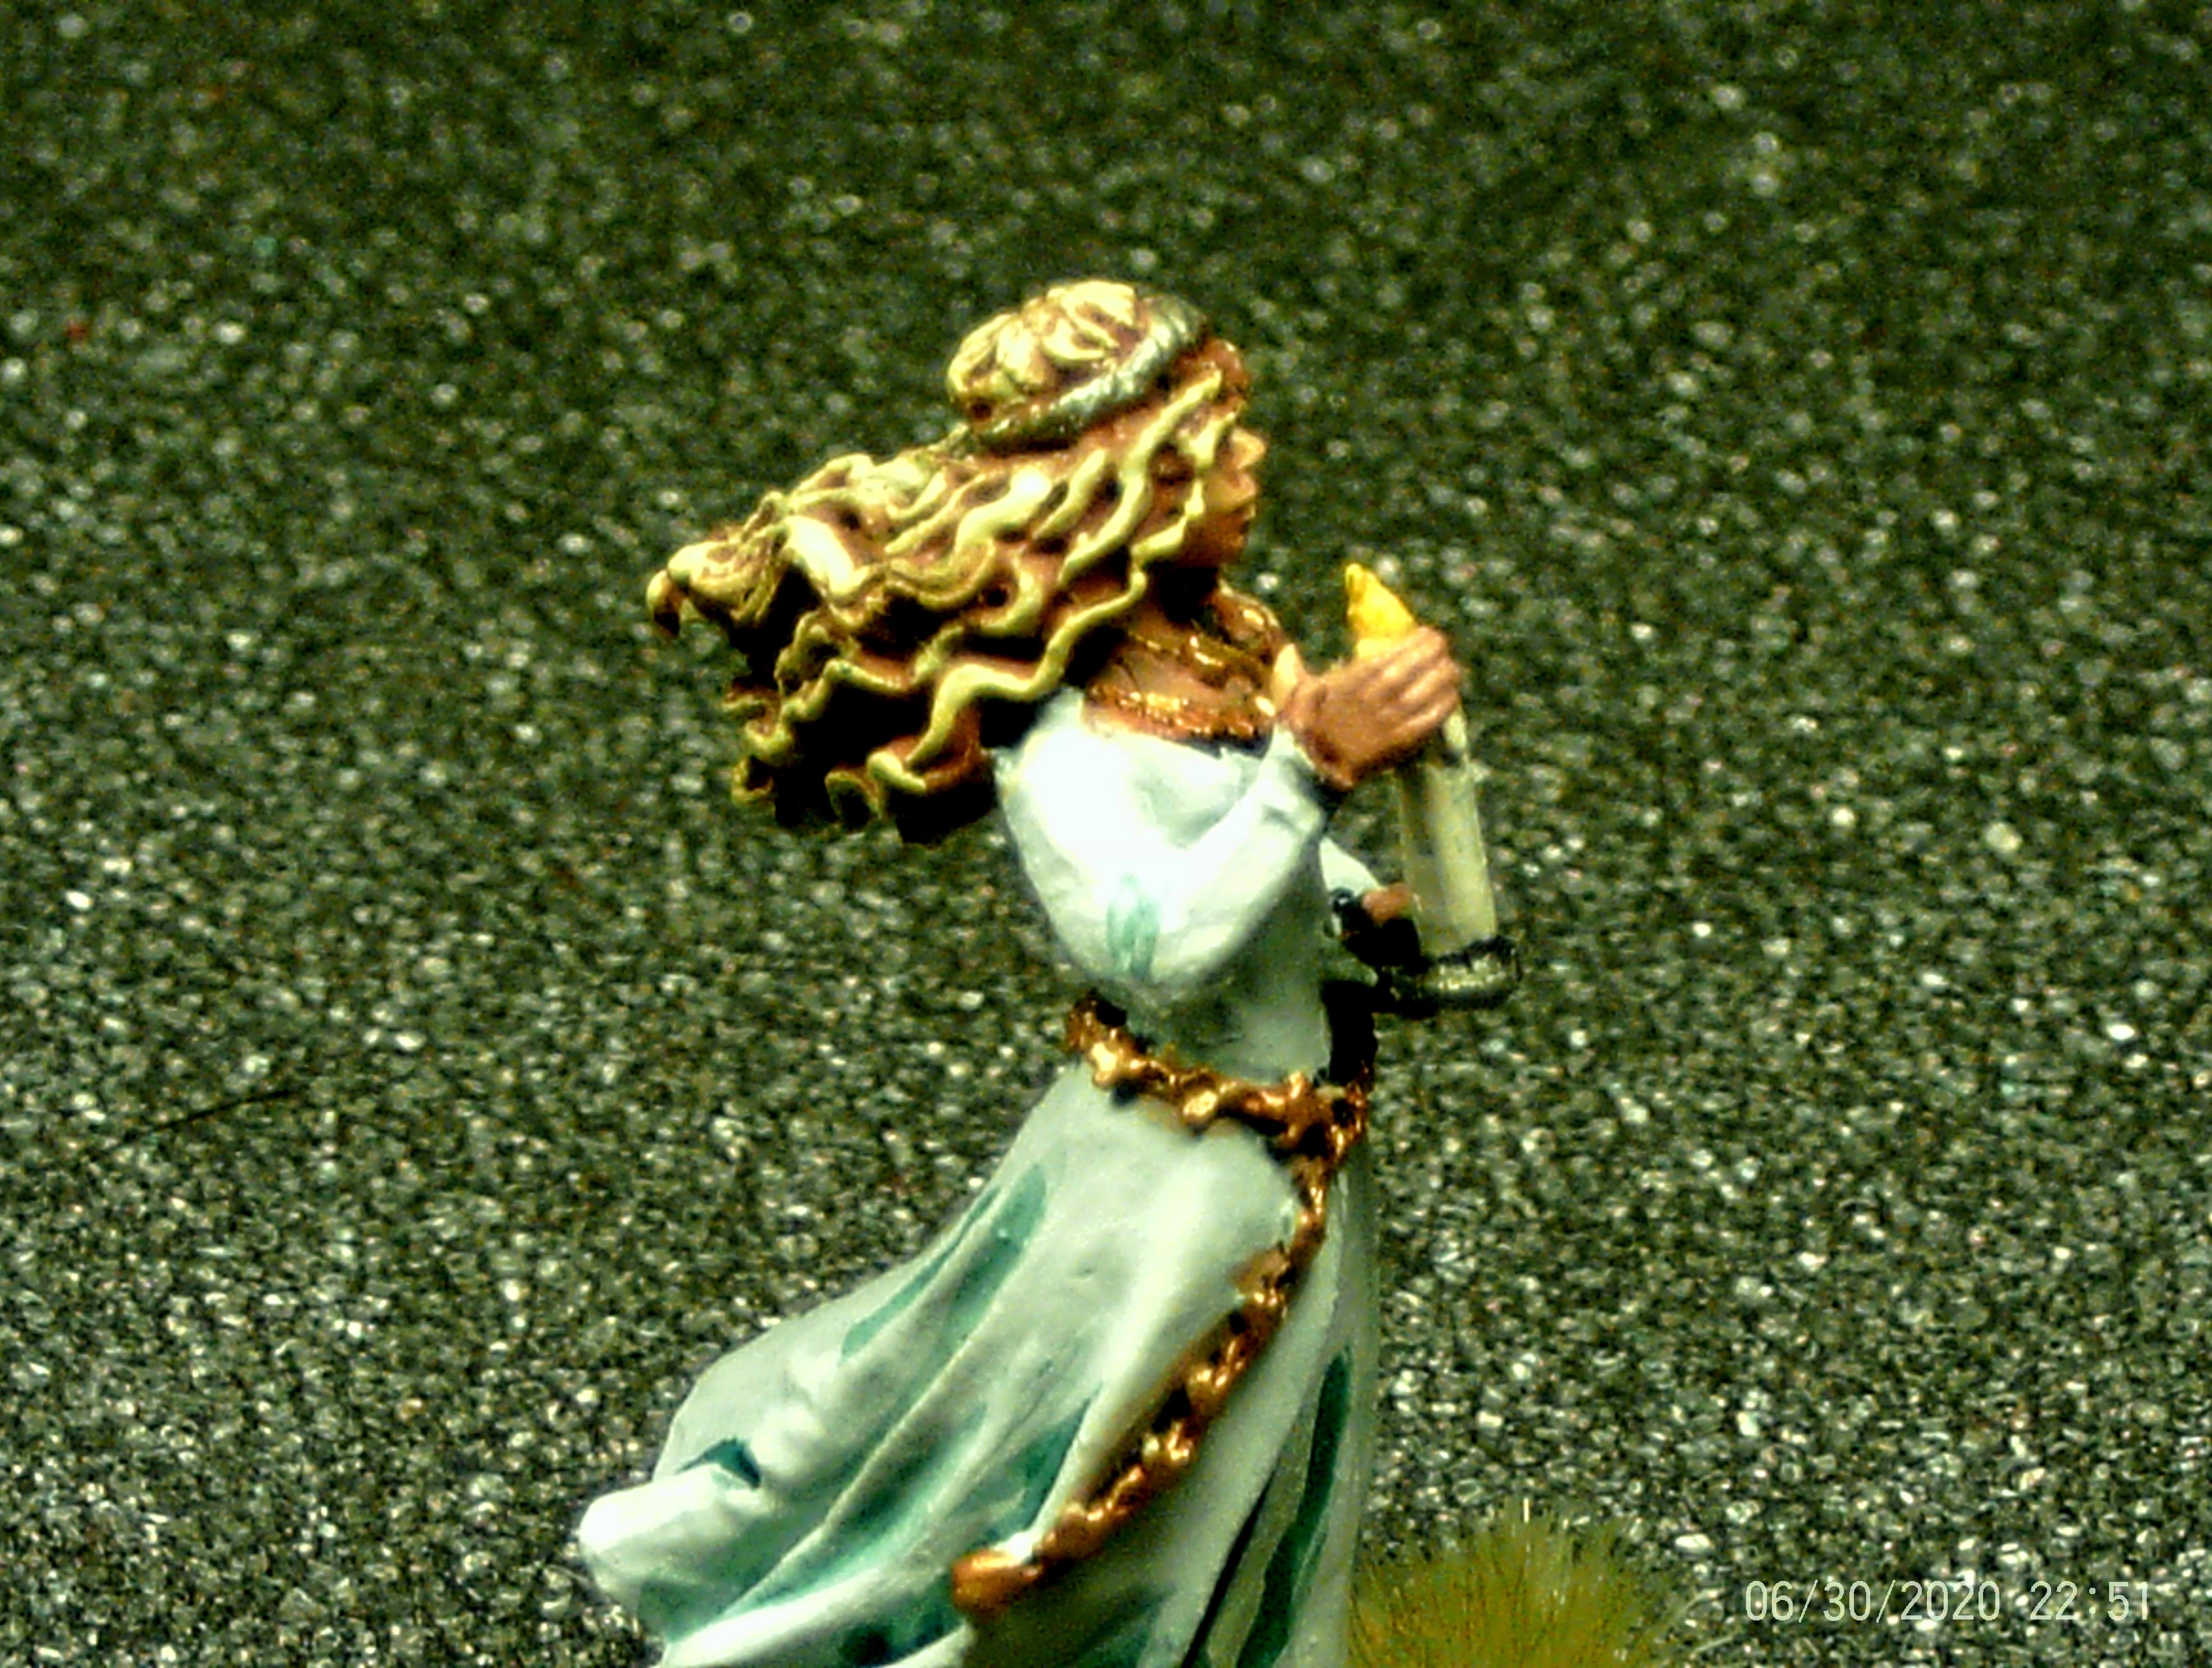 Bombadil, Goldberry, Lord, Middle-earth, Rings, Spirit, Tolkien, Tom, Warhammer Fantasy